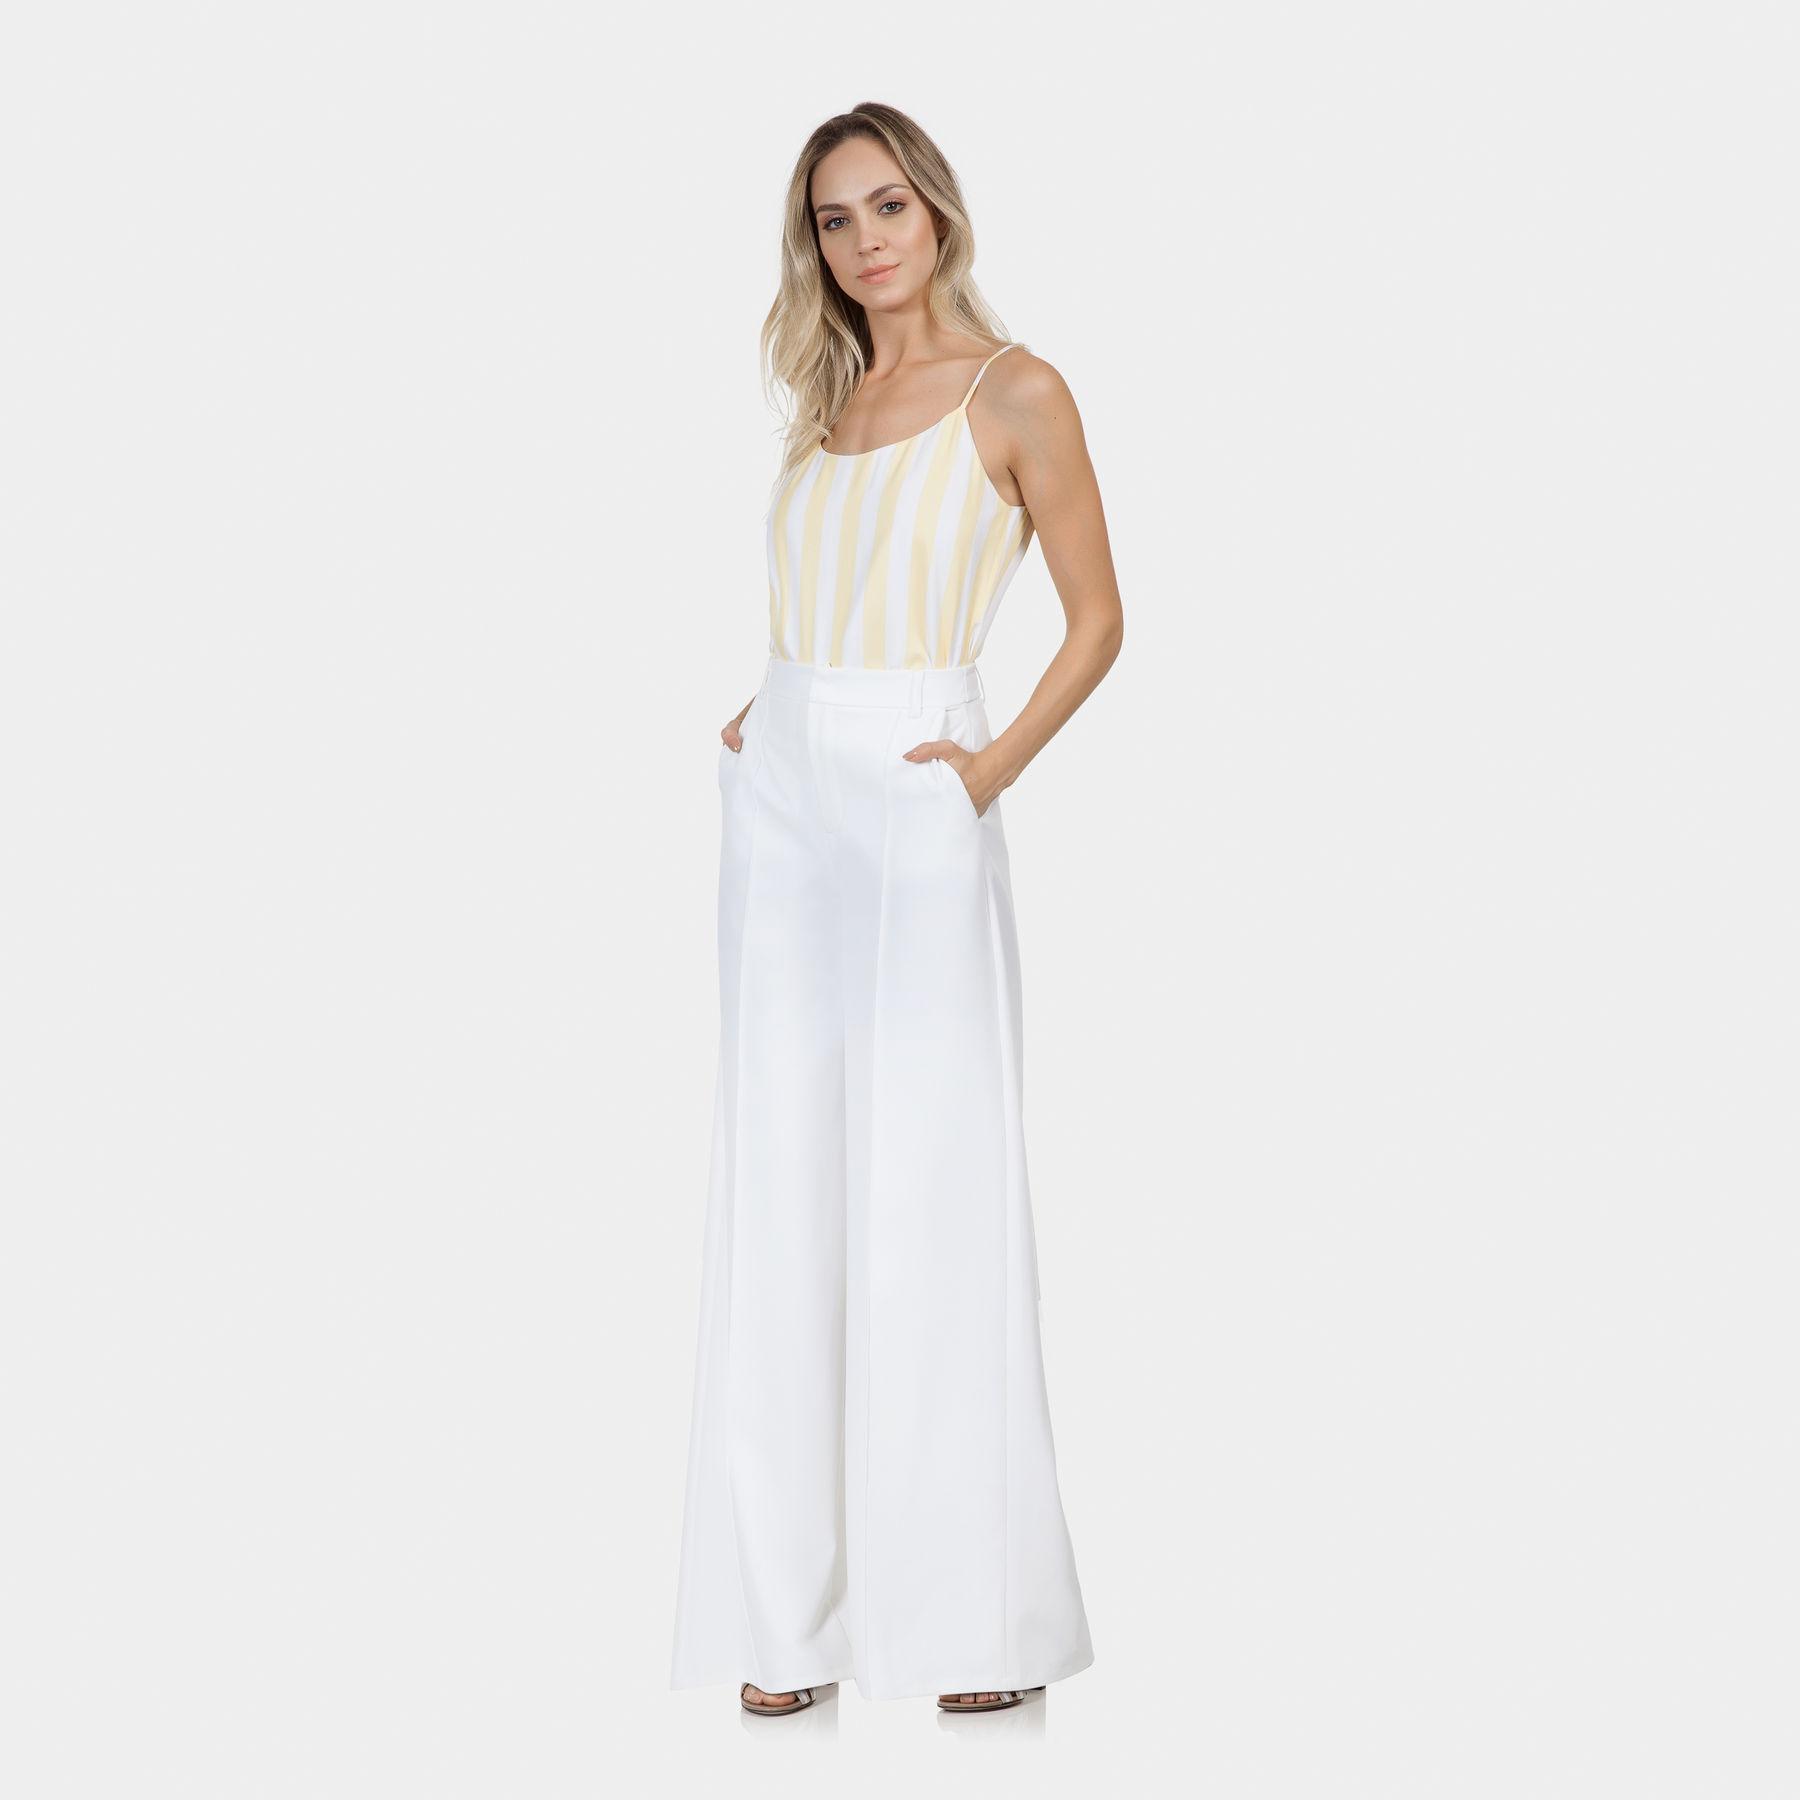 e24b5b416 Calça Pantalona Juliana Jabour Branco Off White - Lez a Lez